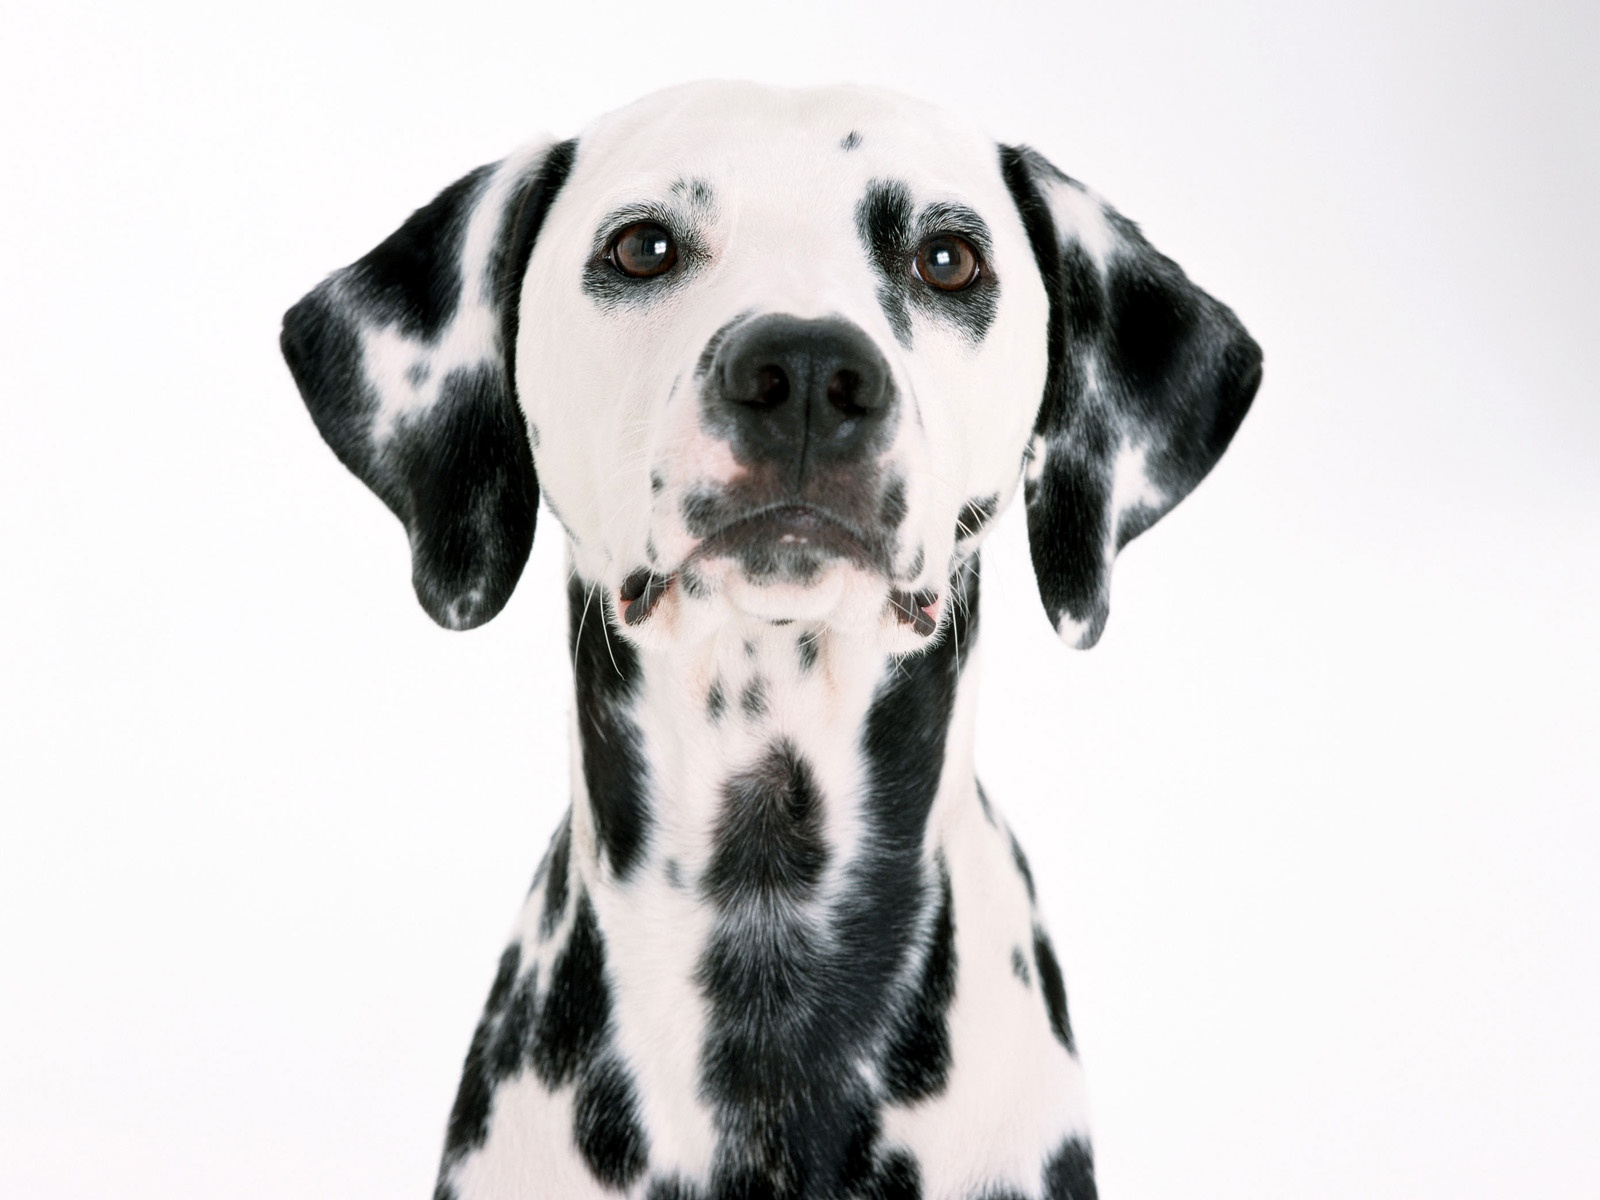 Долматинец, дог, собака, фото обои